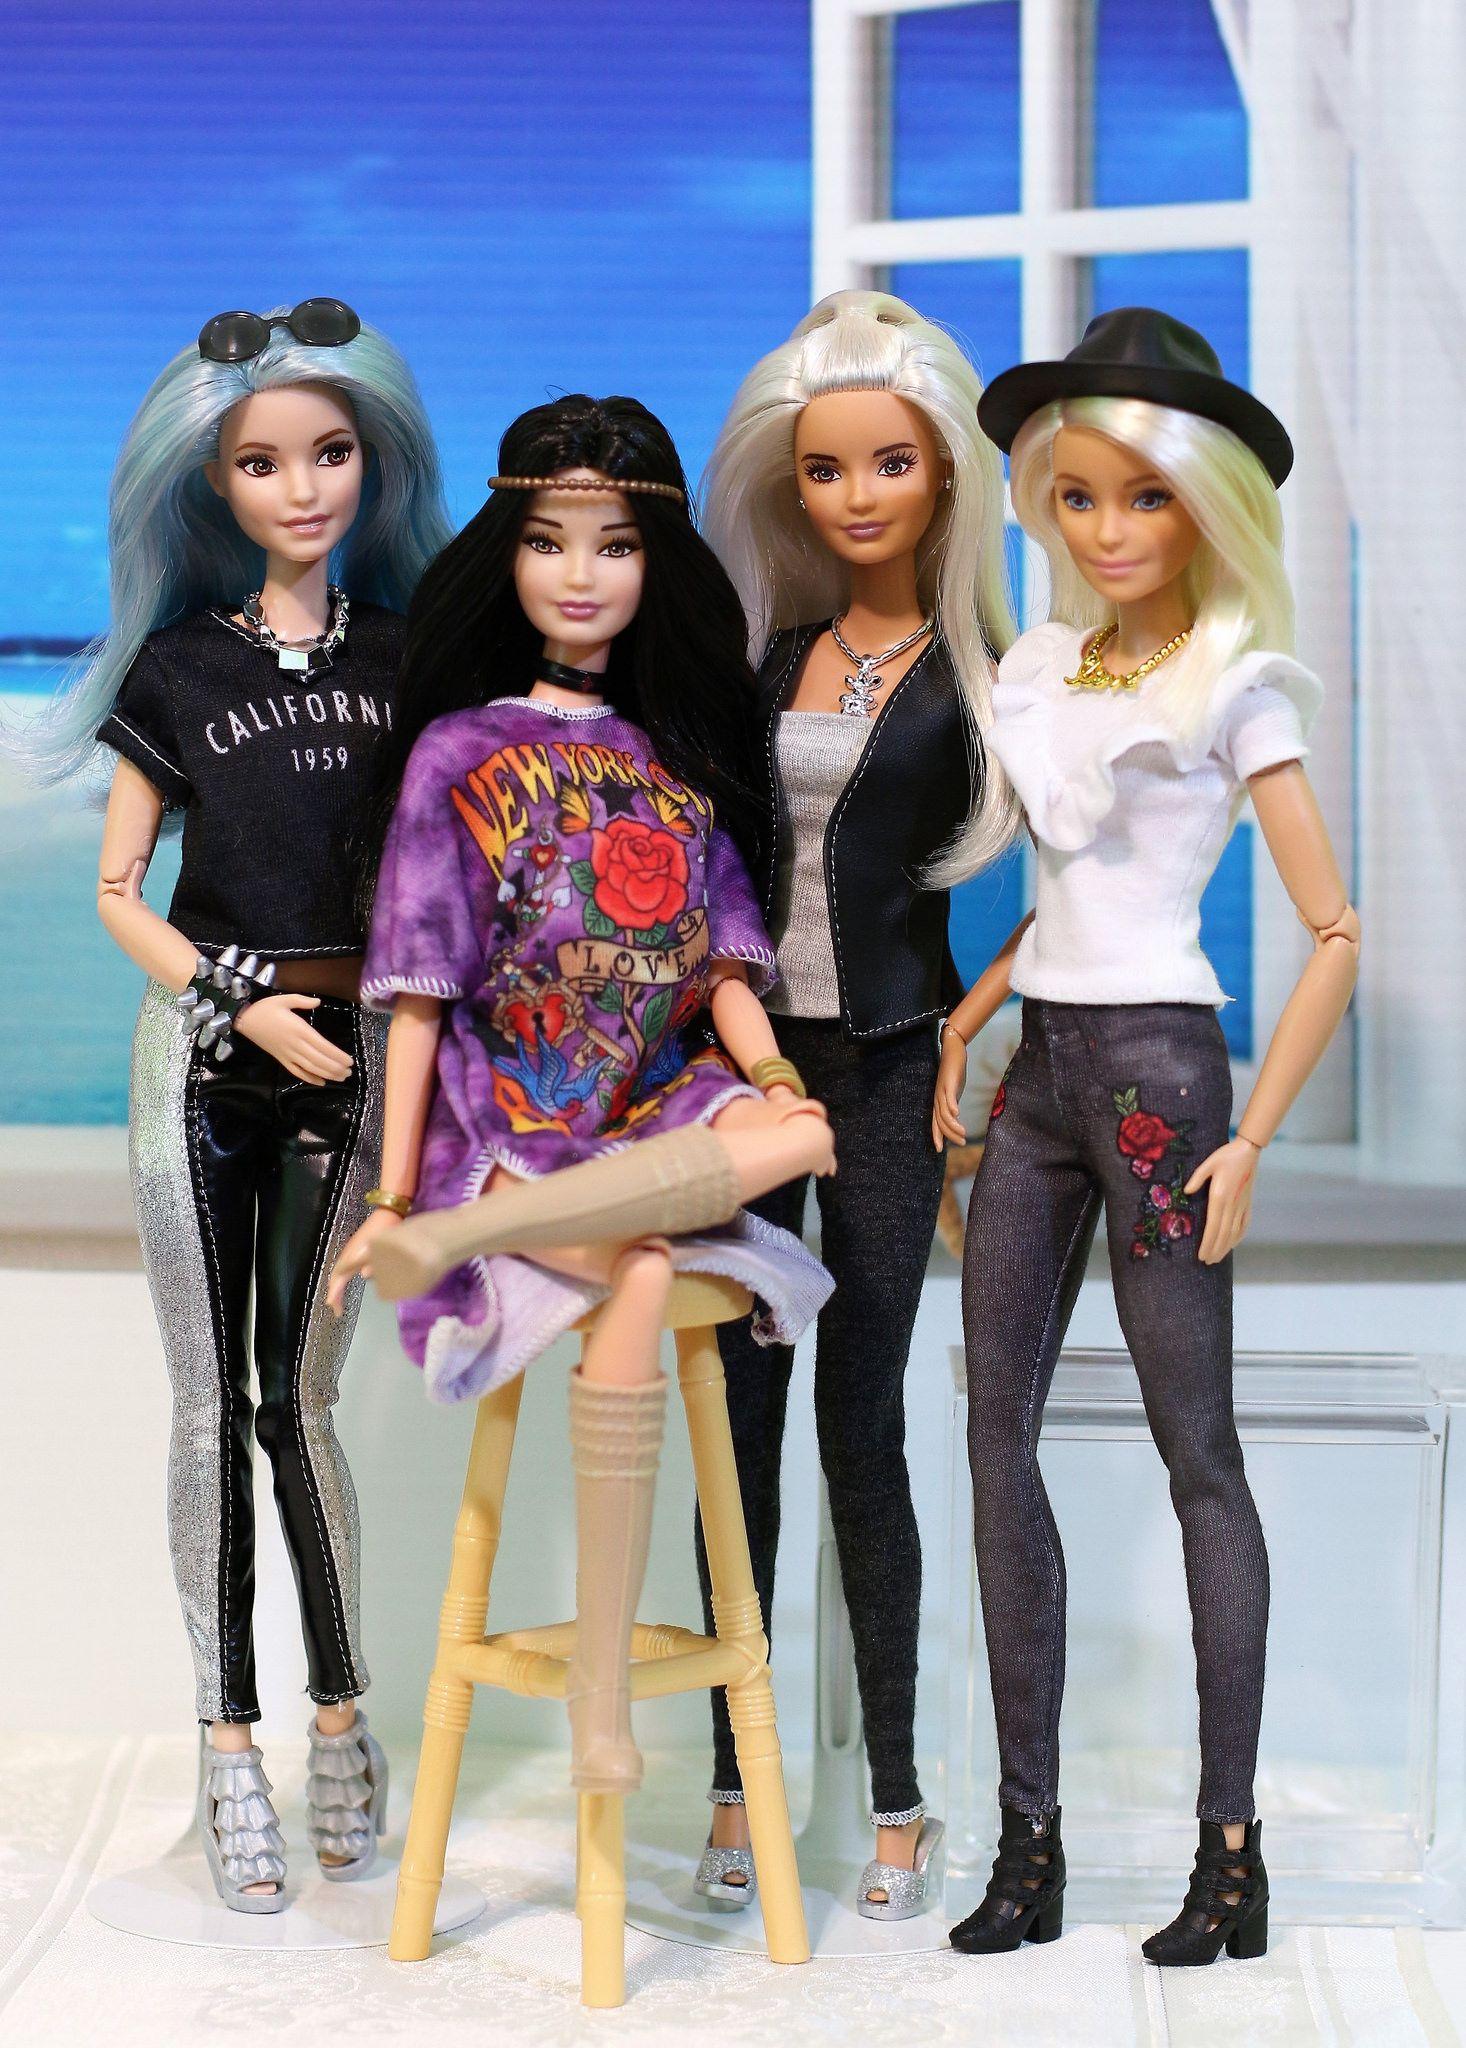 Music Festival Fashionistas Barbie Fashion Diy Barbie Clothes